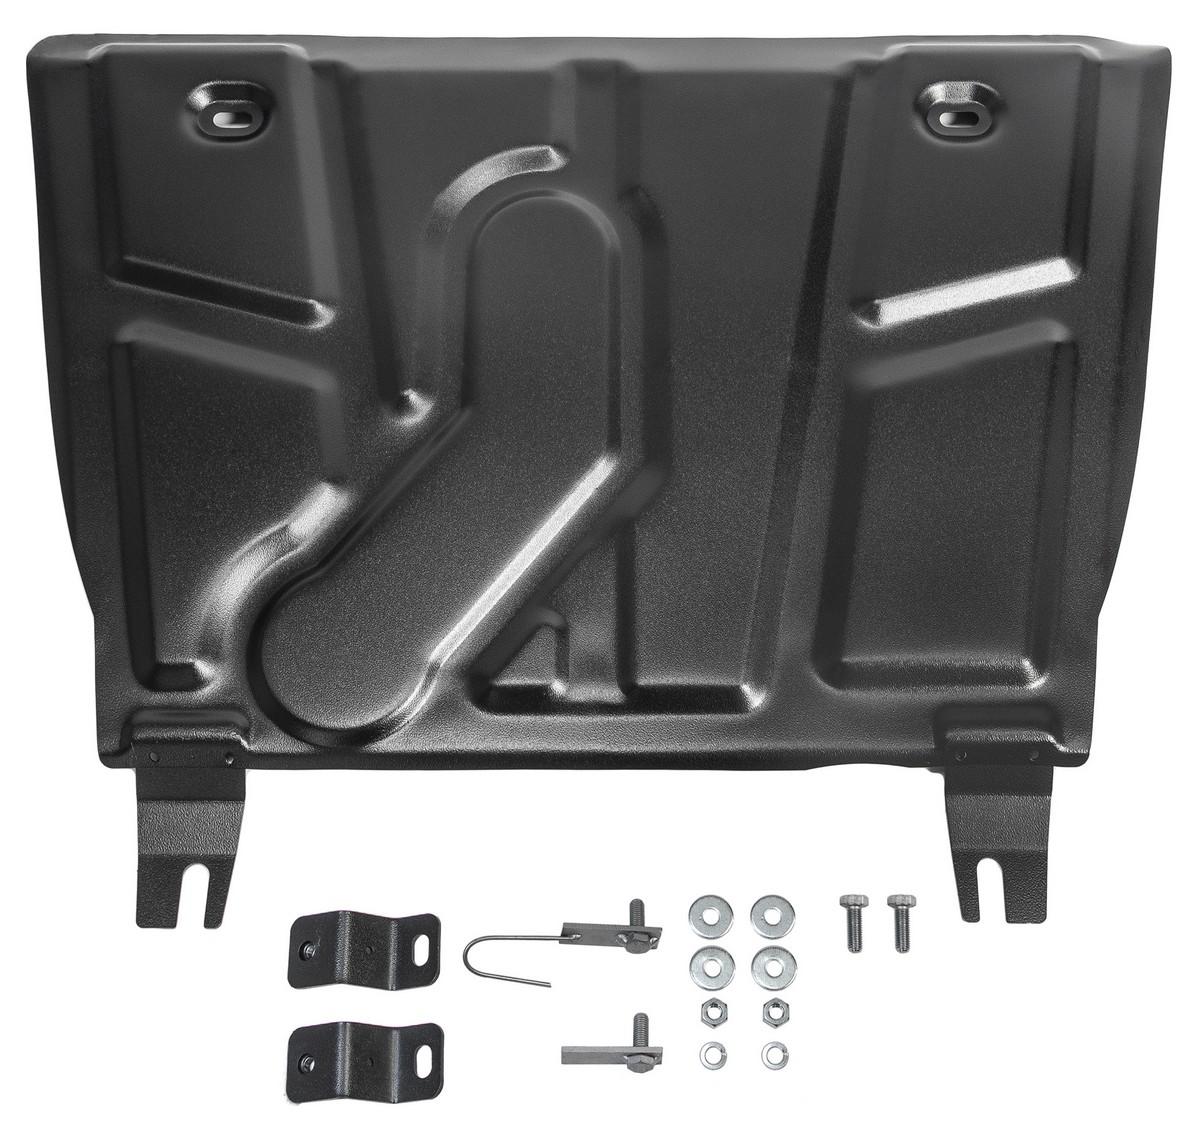 Защита картера и КПП Rival для Toyota RAV4 XA30, CA40 2010-2019, с крепежом, 111.5709.1